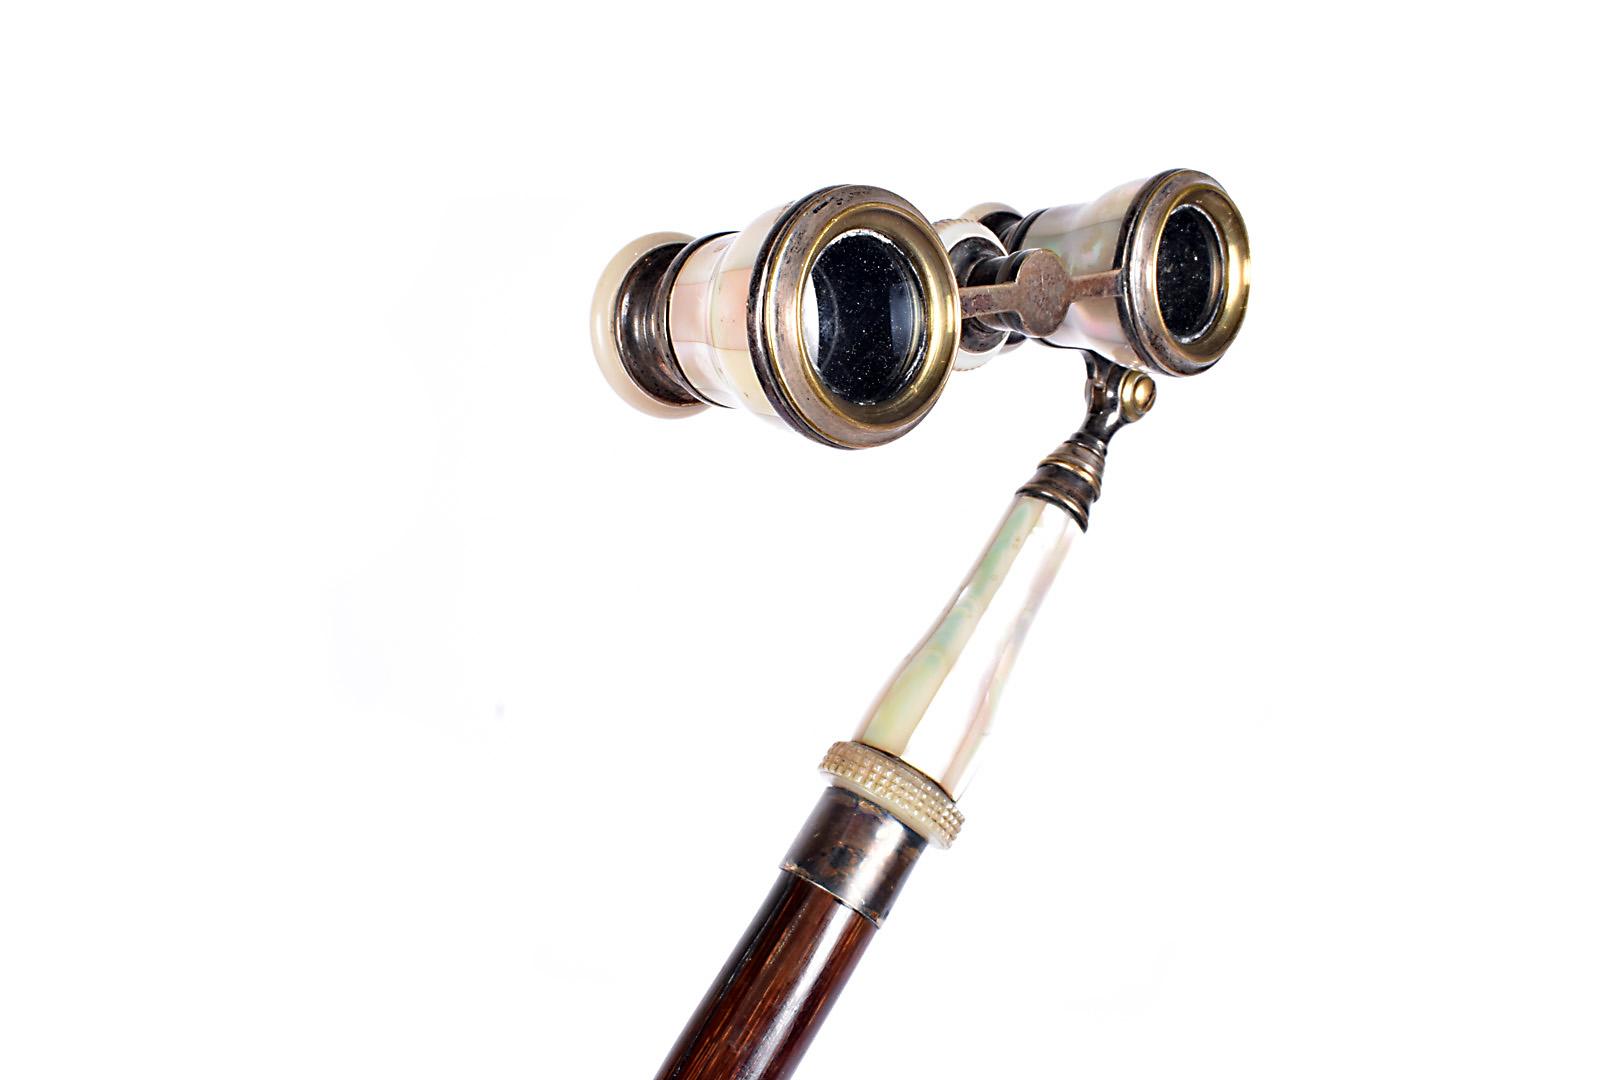 An Opera glass walking stick, the Stewart Dawson & Co Ltd mother of pearl pair of opera glasses